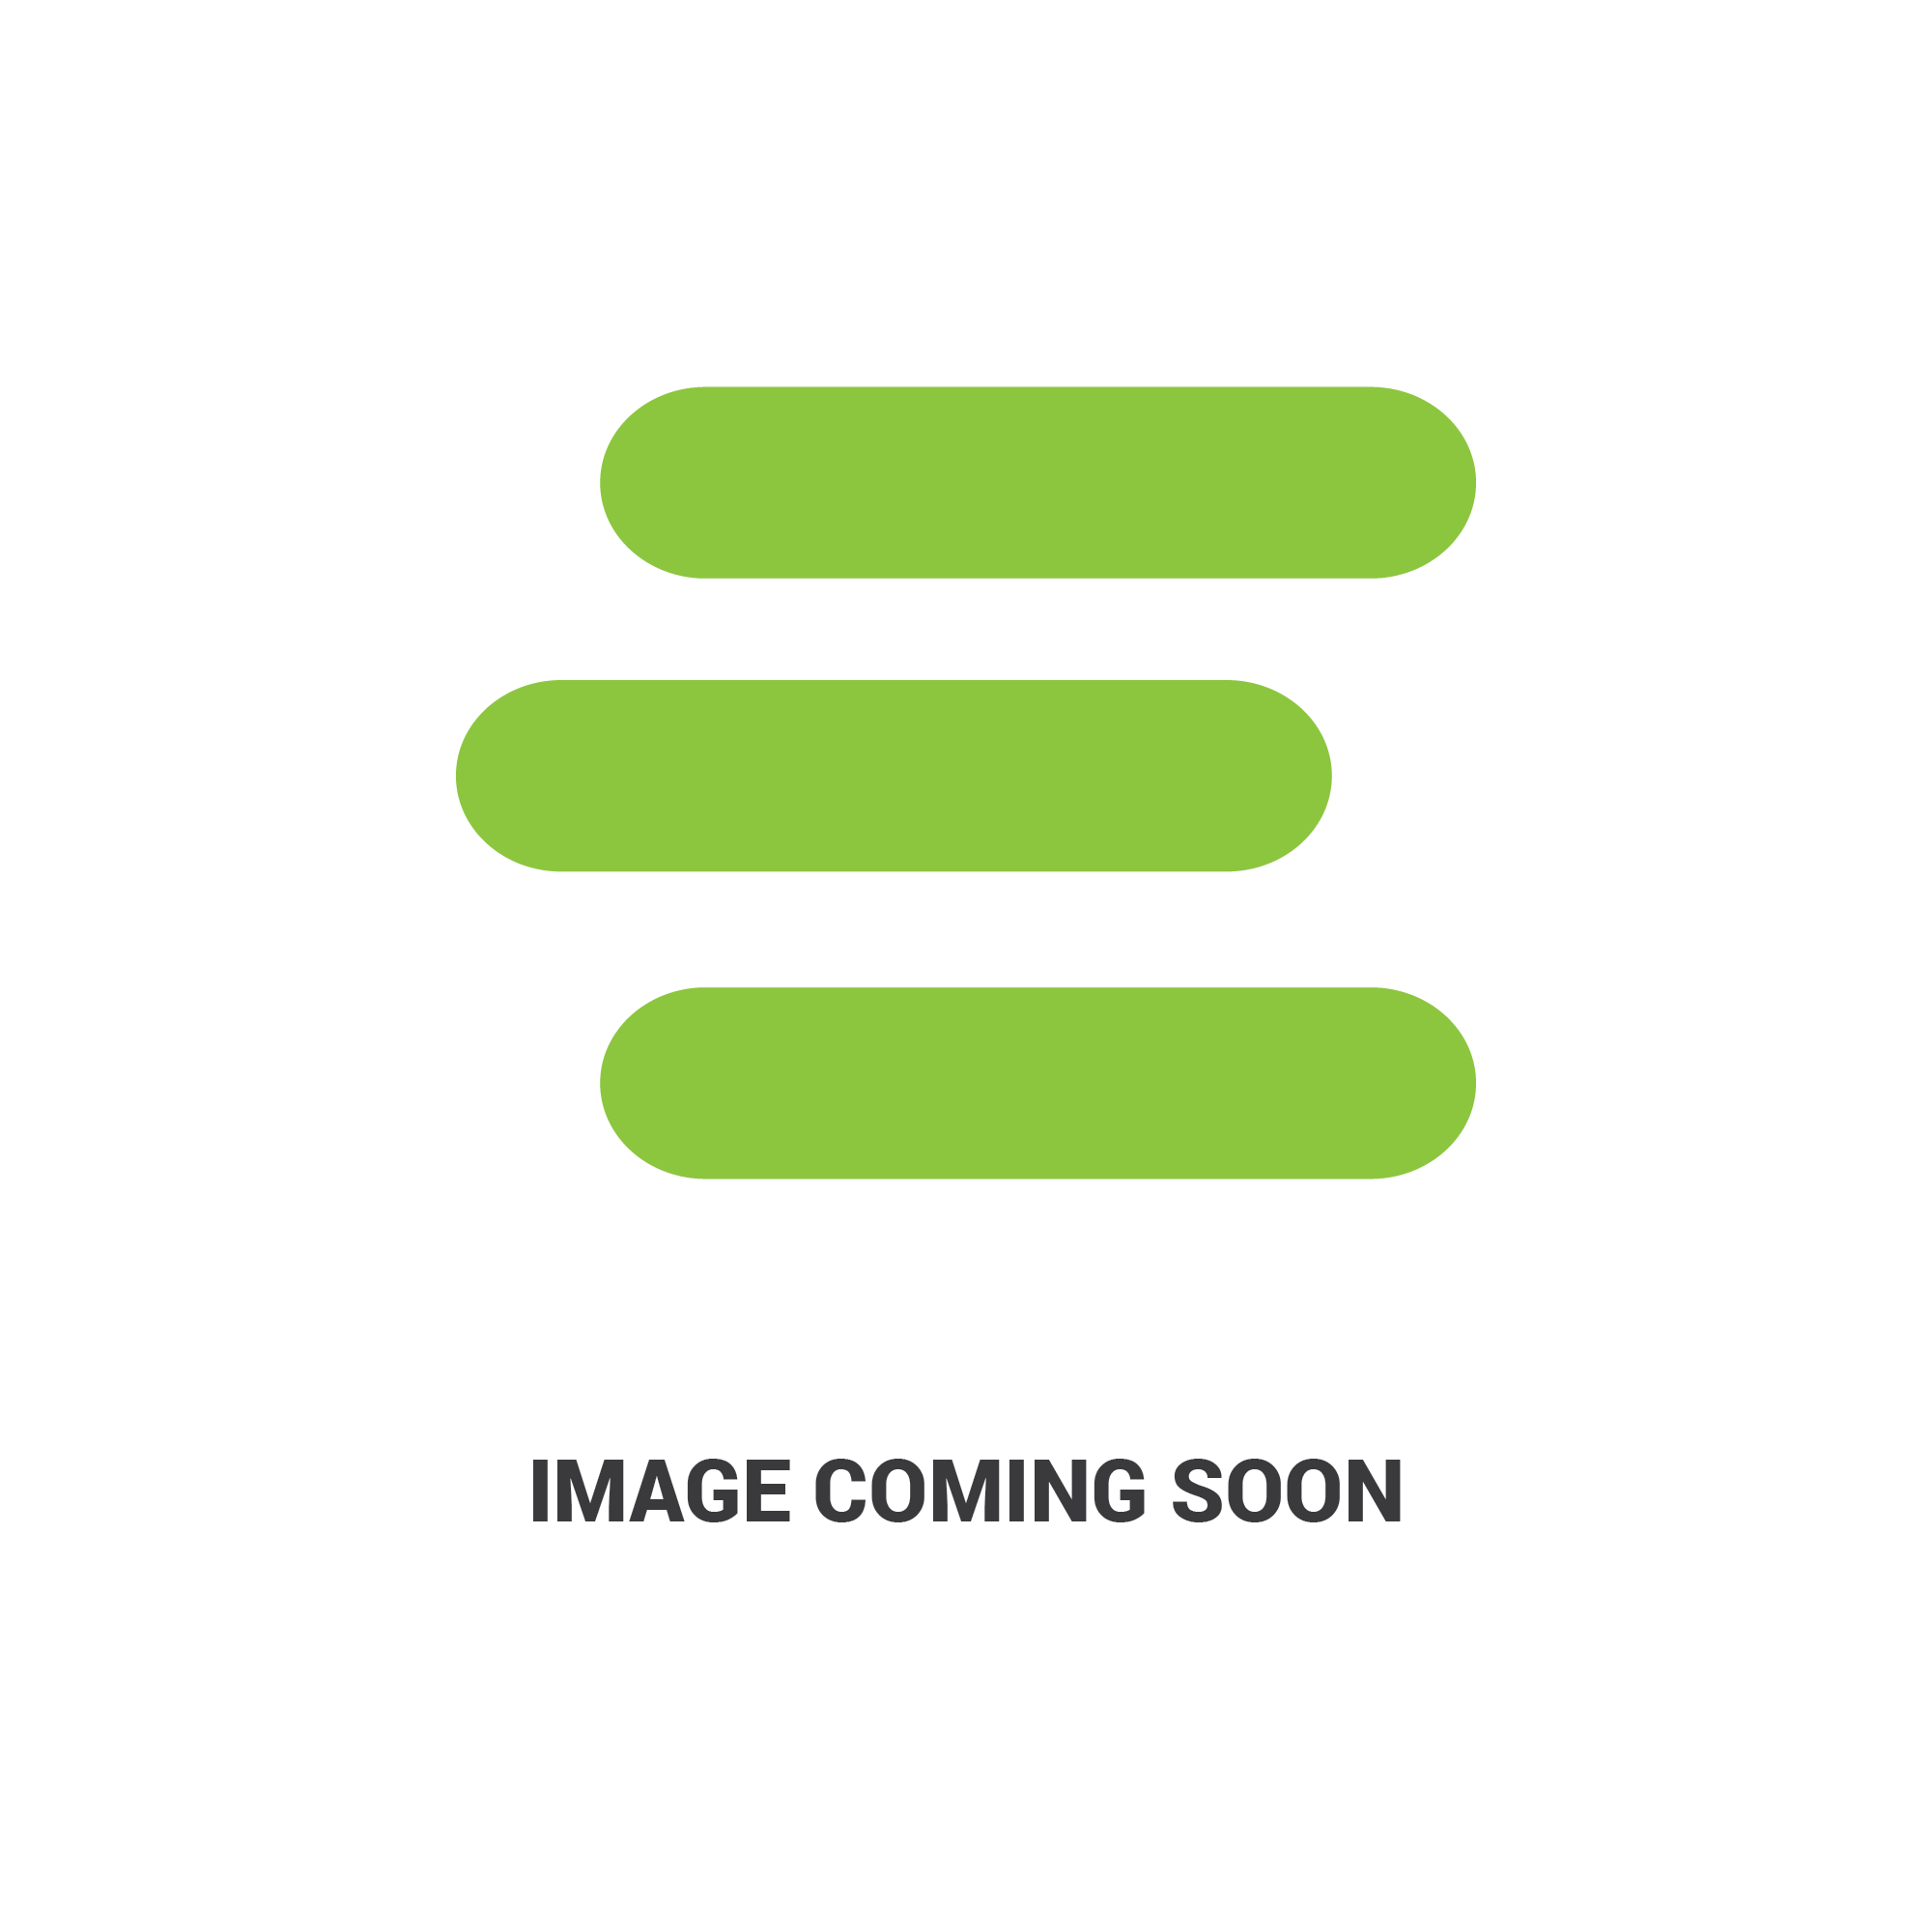 E-87021178edit 1.jpg